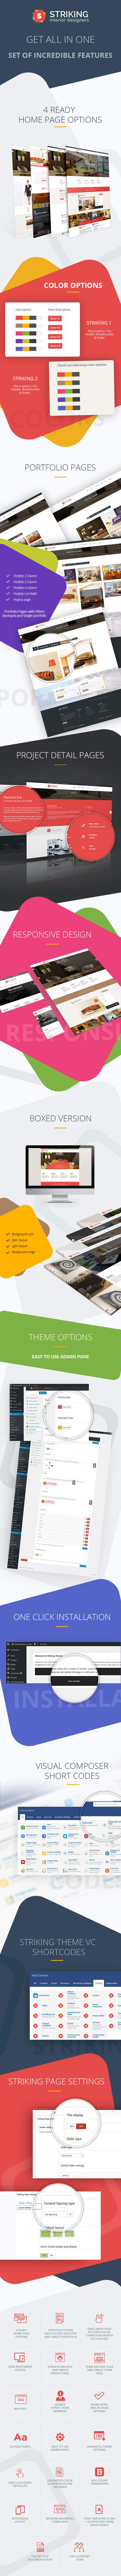 Architecture Interior Designer WordPress Theme - Striking - 2